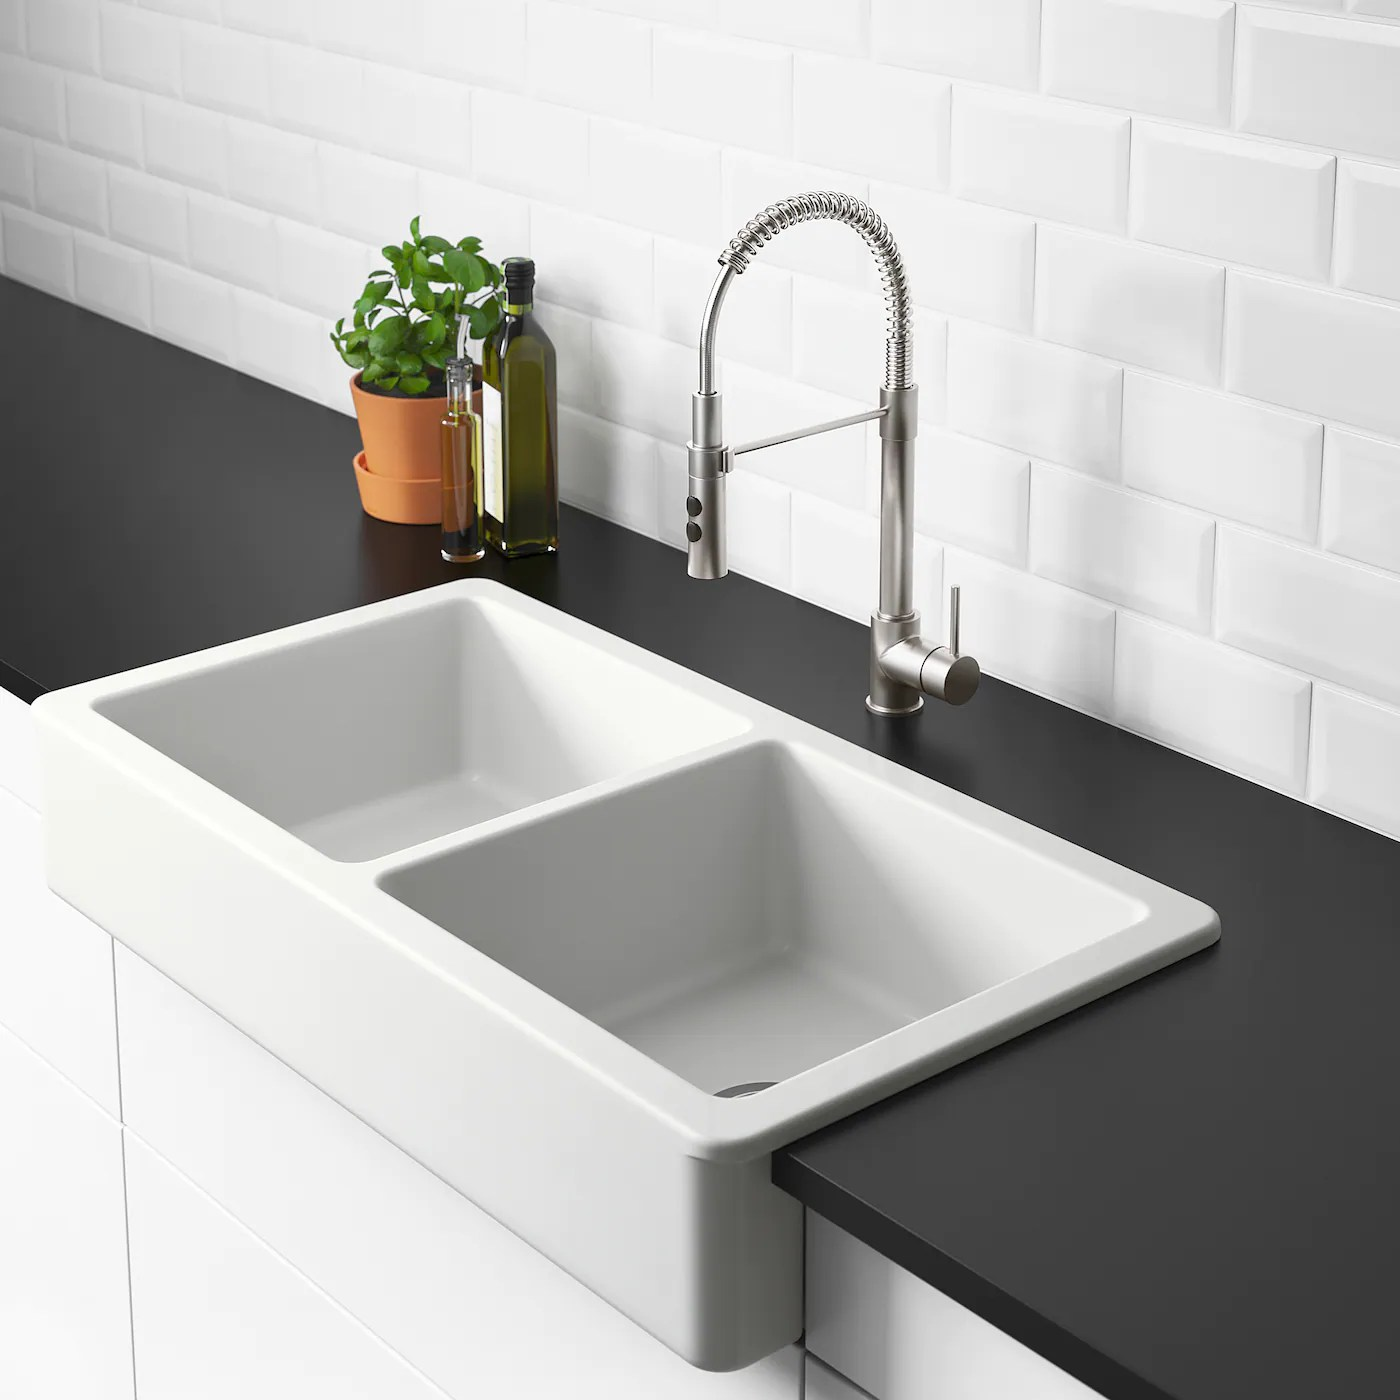 havsen apron front double bowl sink white 37x19